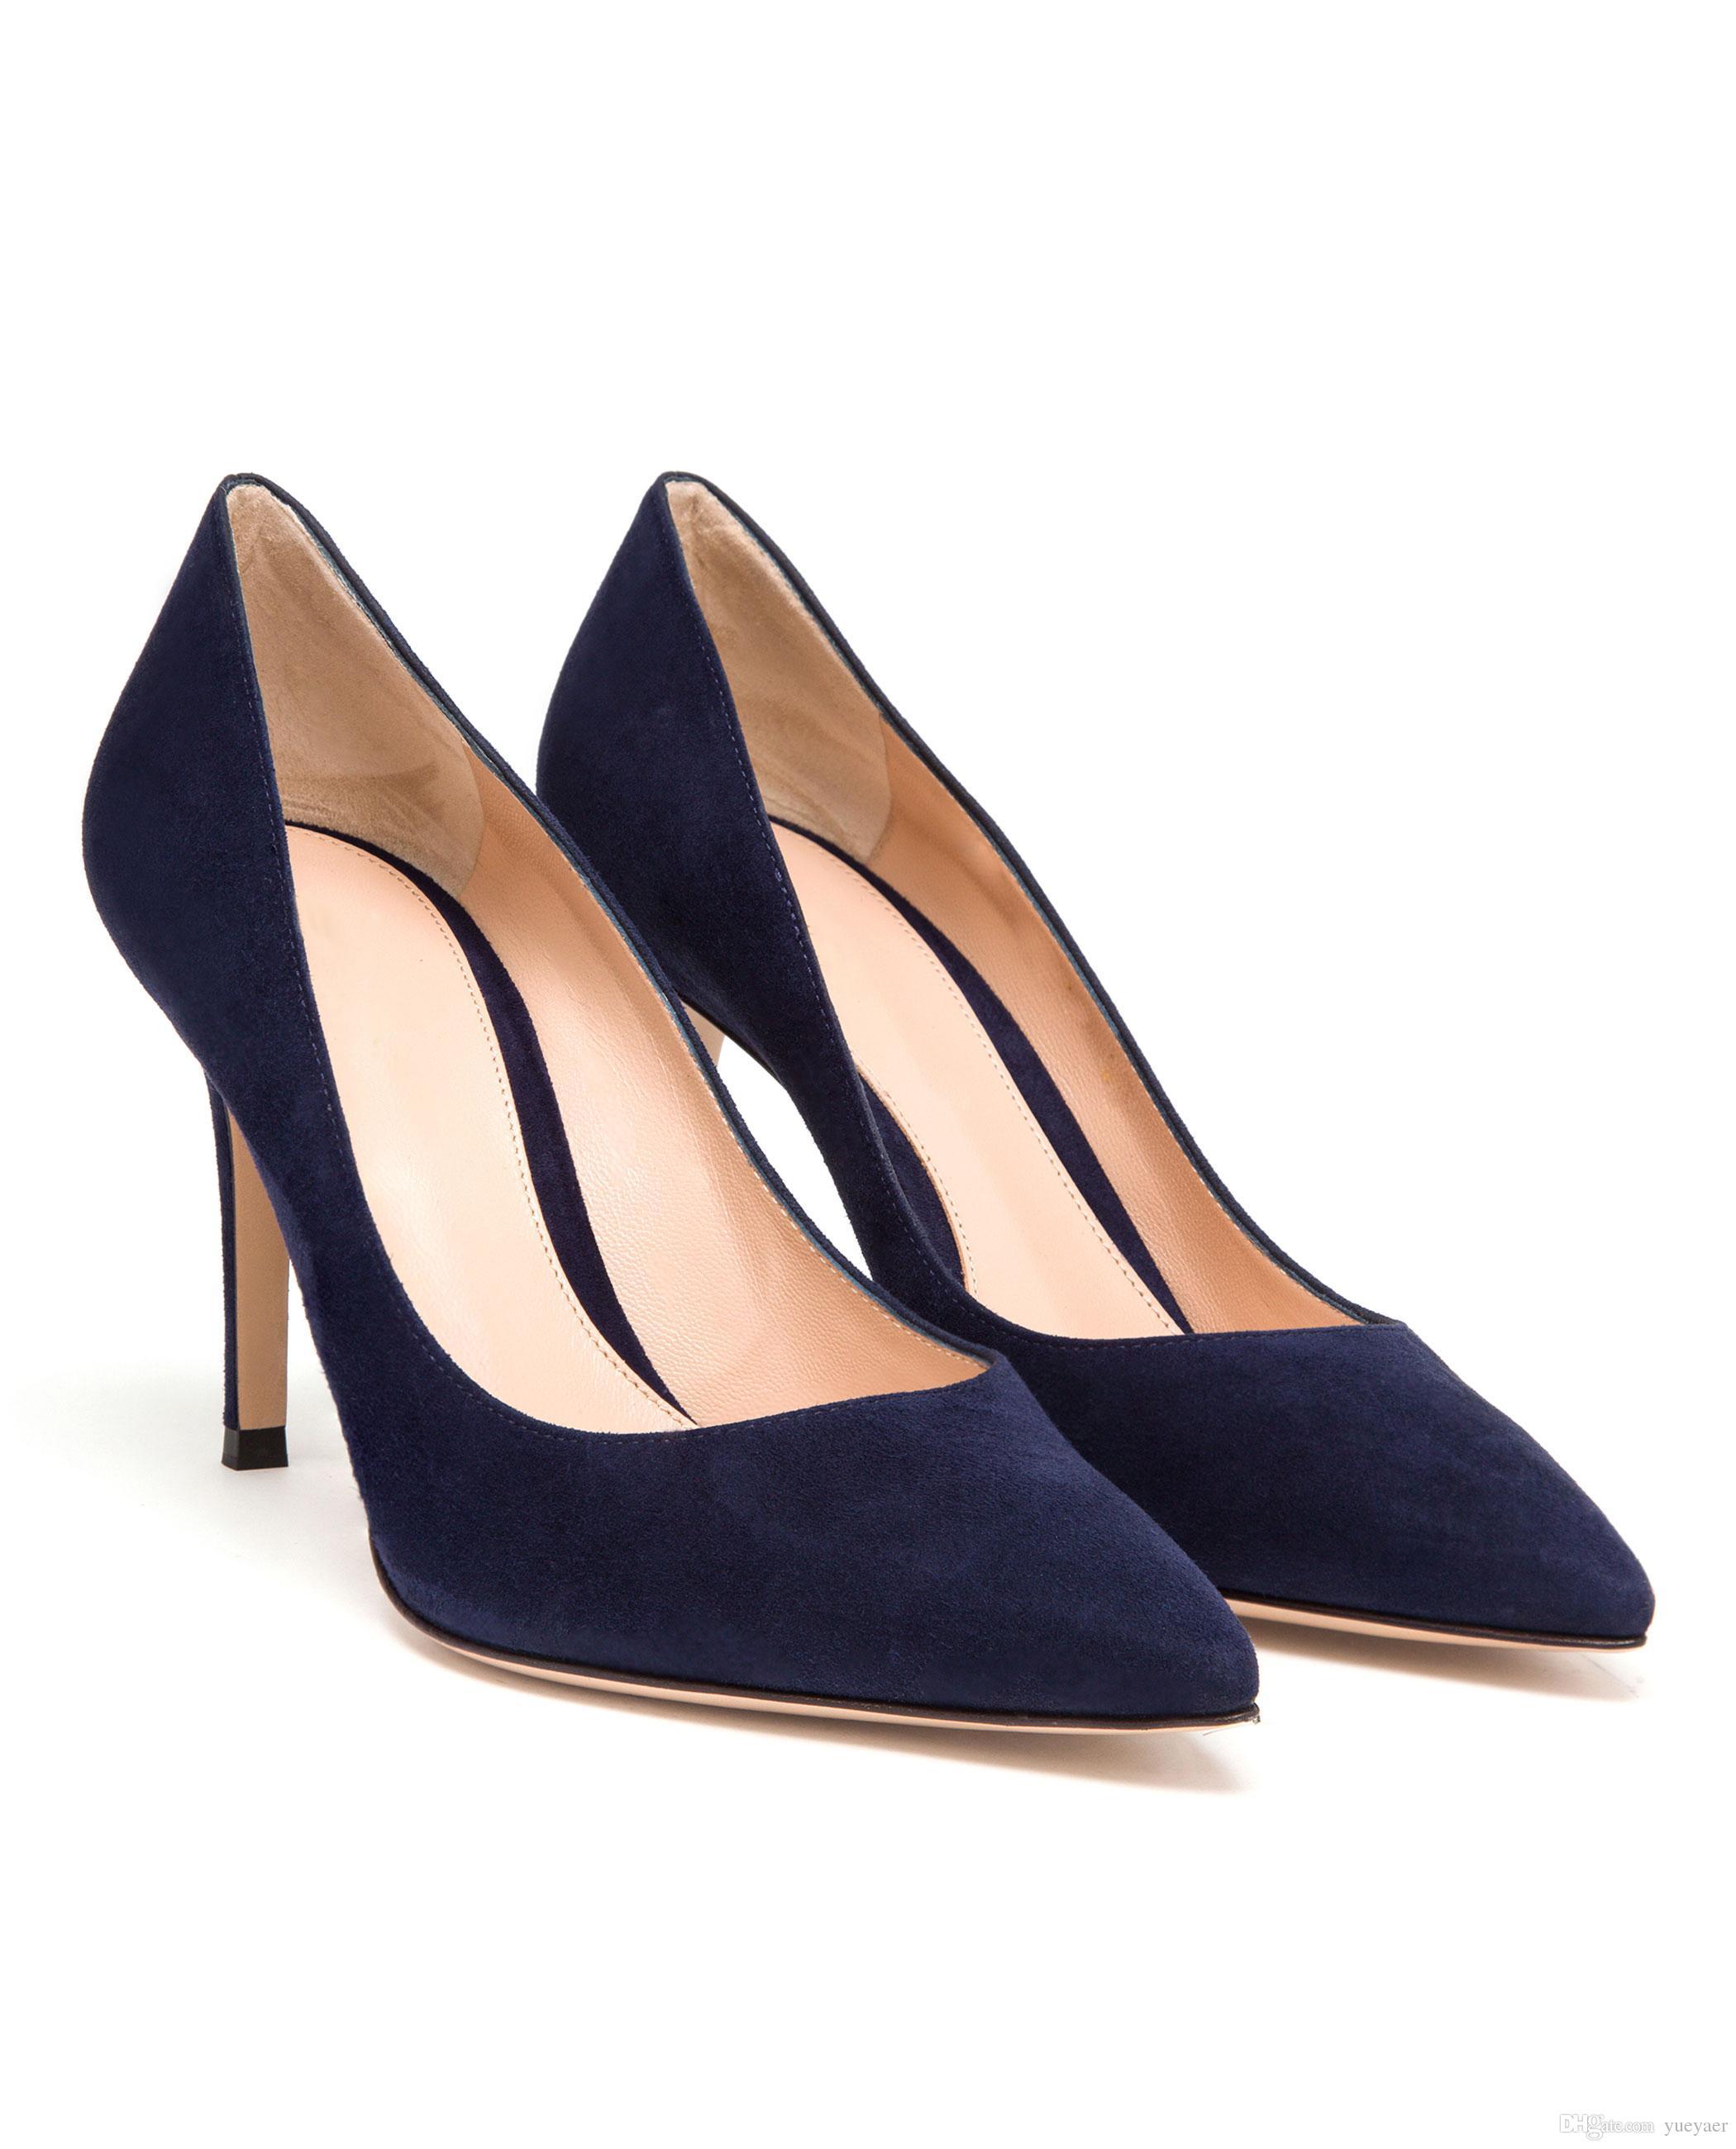 Zandina Ladies Handmade 16cm Super-Heel Dress Shoes LAMIE Party Club Fashion Evening Pumps Shoes